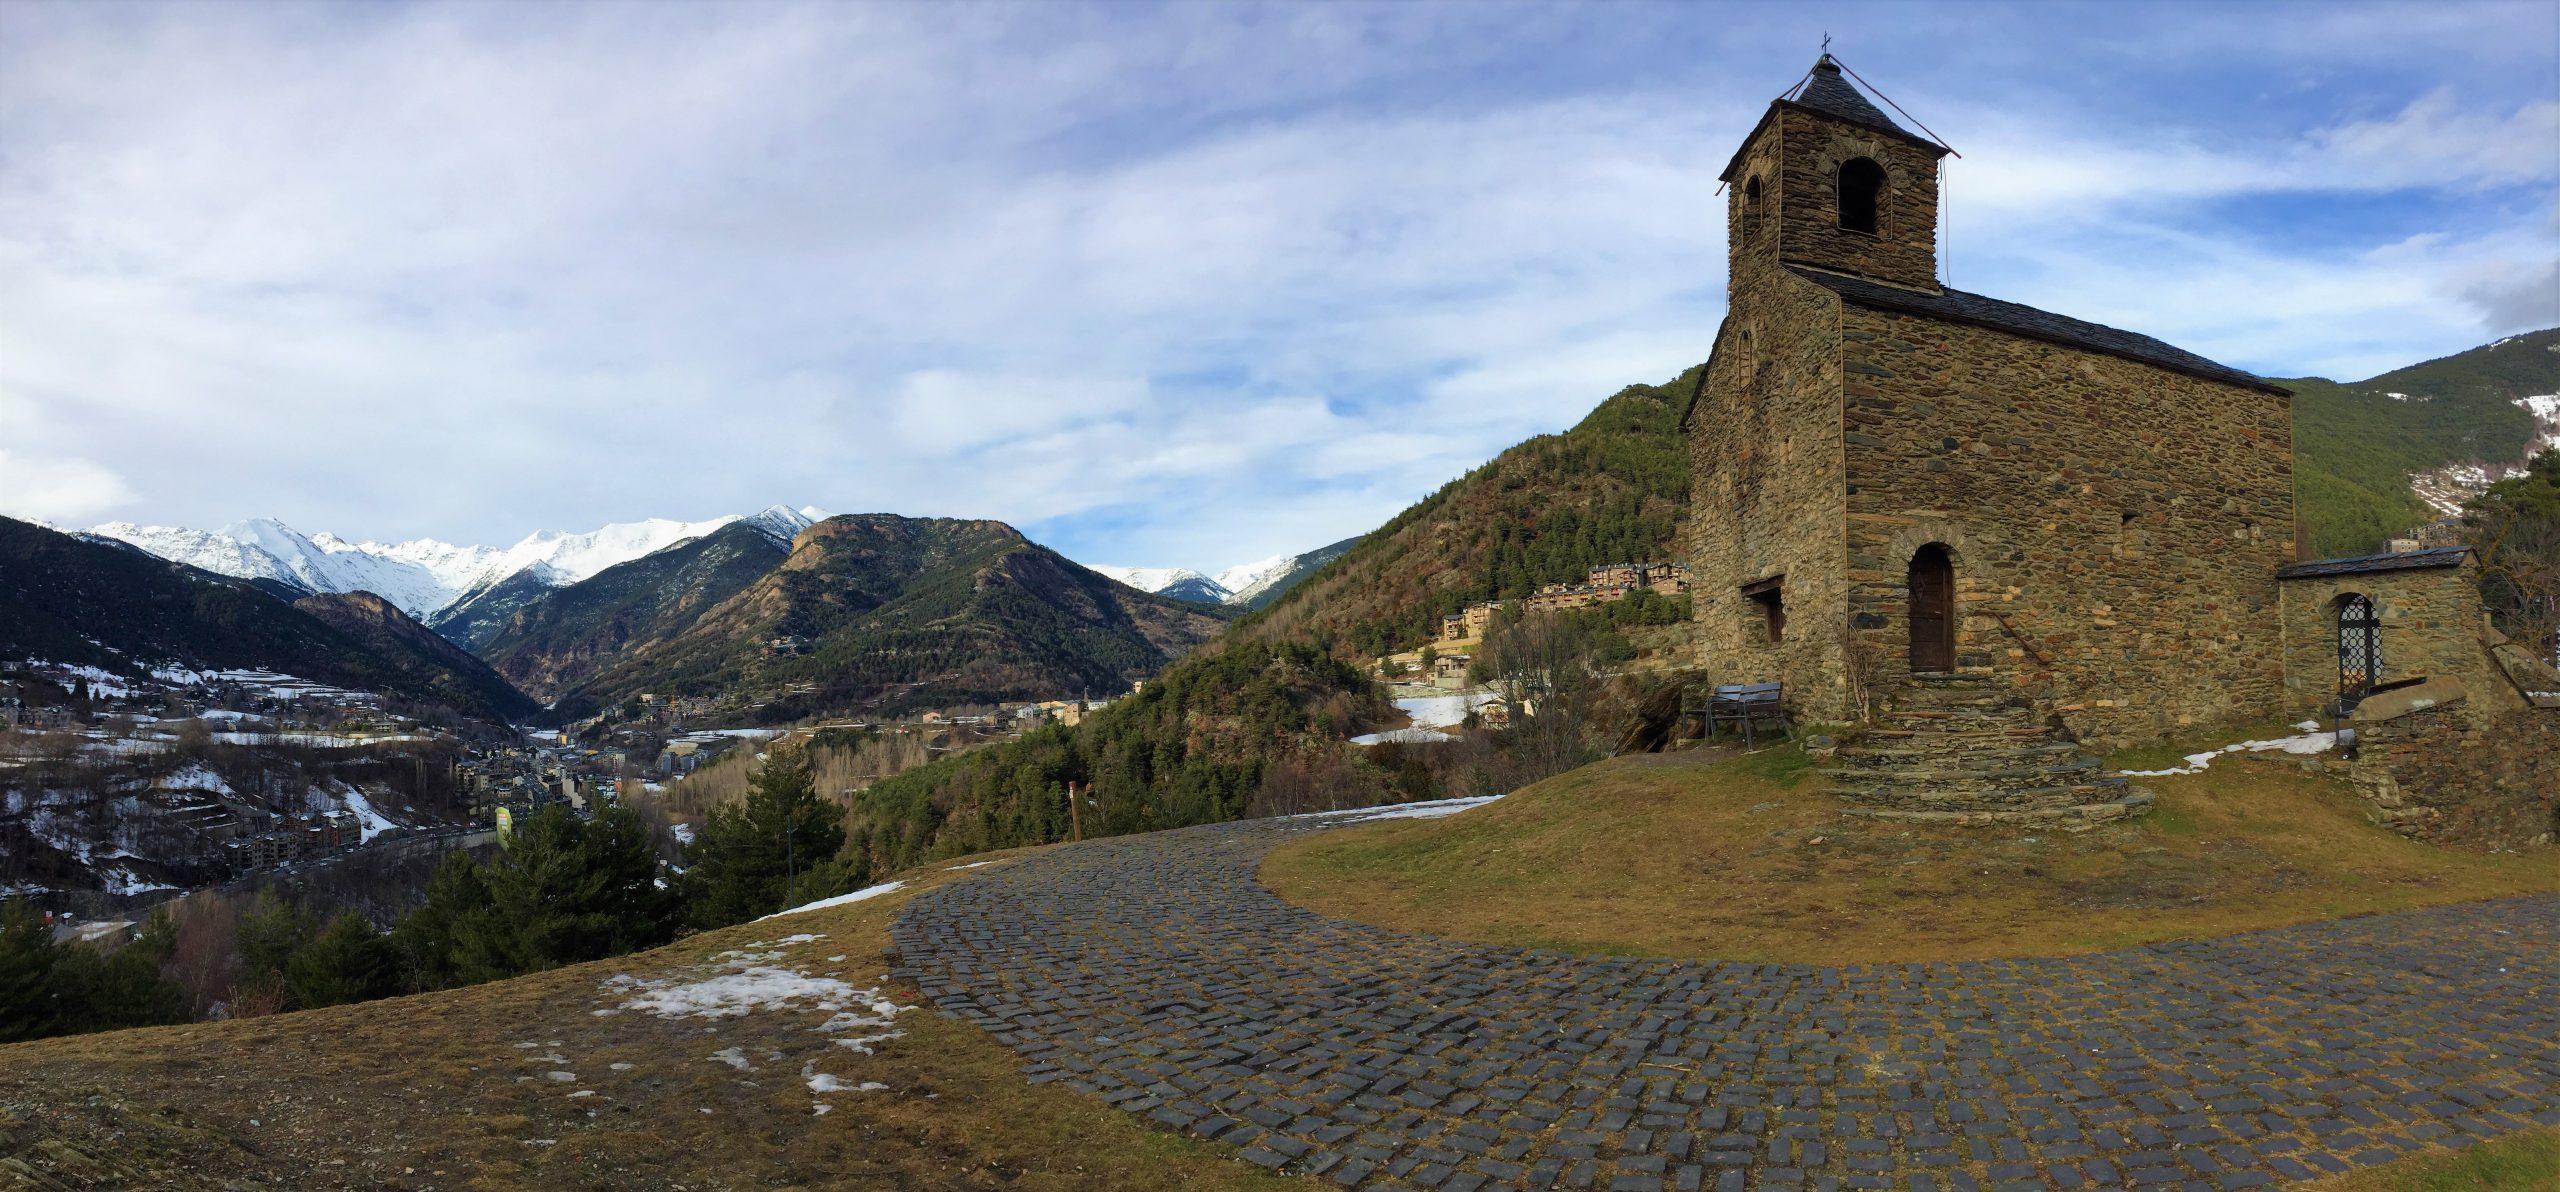 anyos et son église en andorre